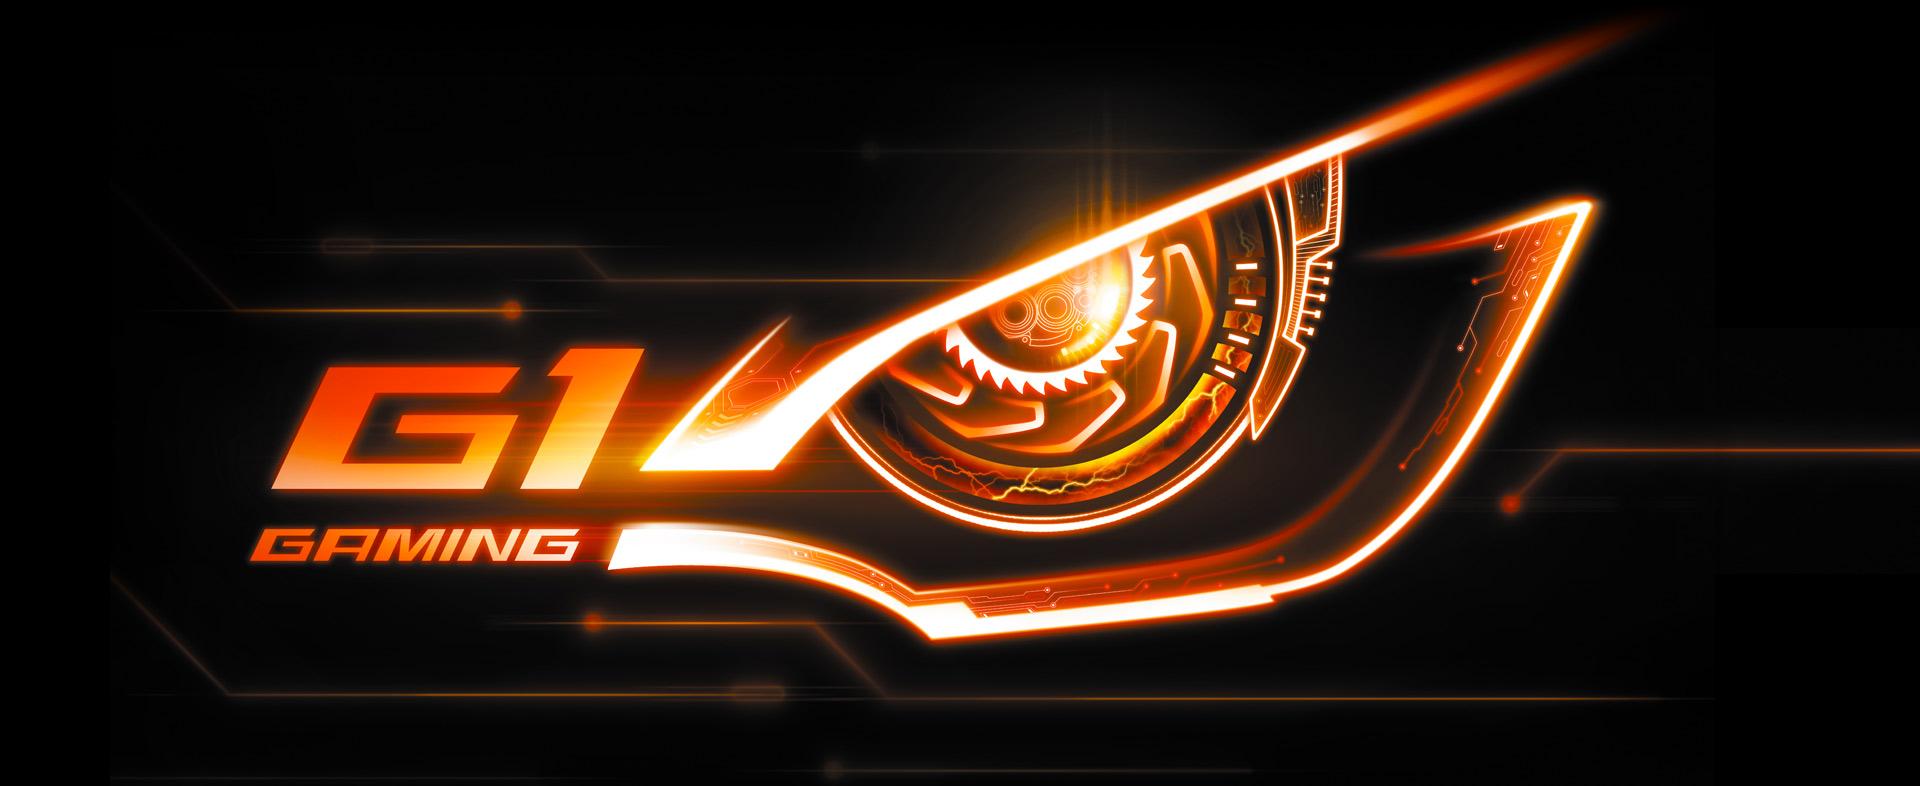 GeForce® GTX 1070 G1 Gaming 8G (rev  1 0) | Graphics Card - GIGABYTE